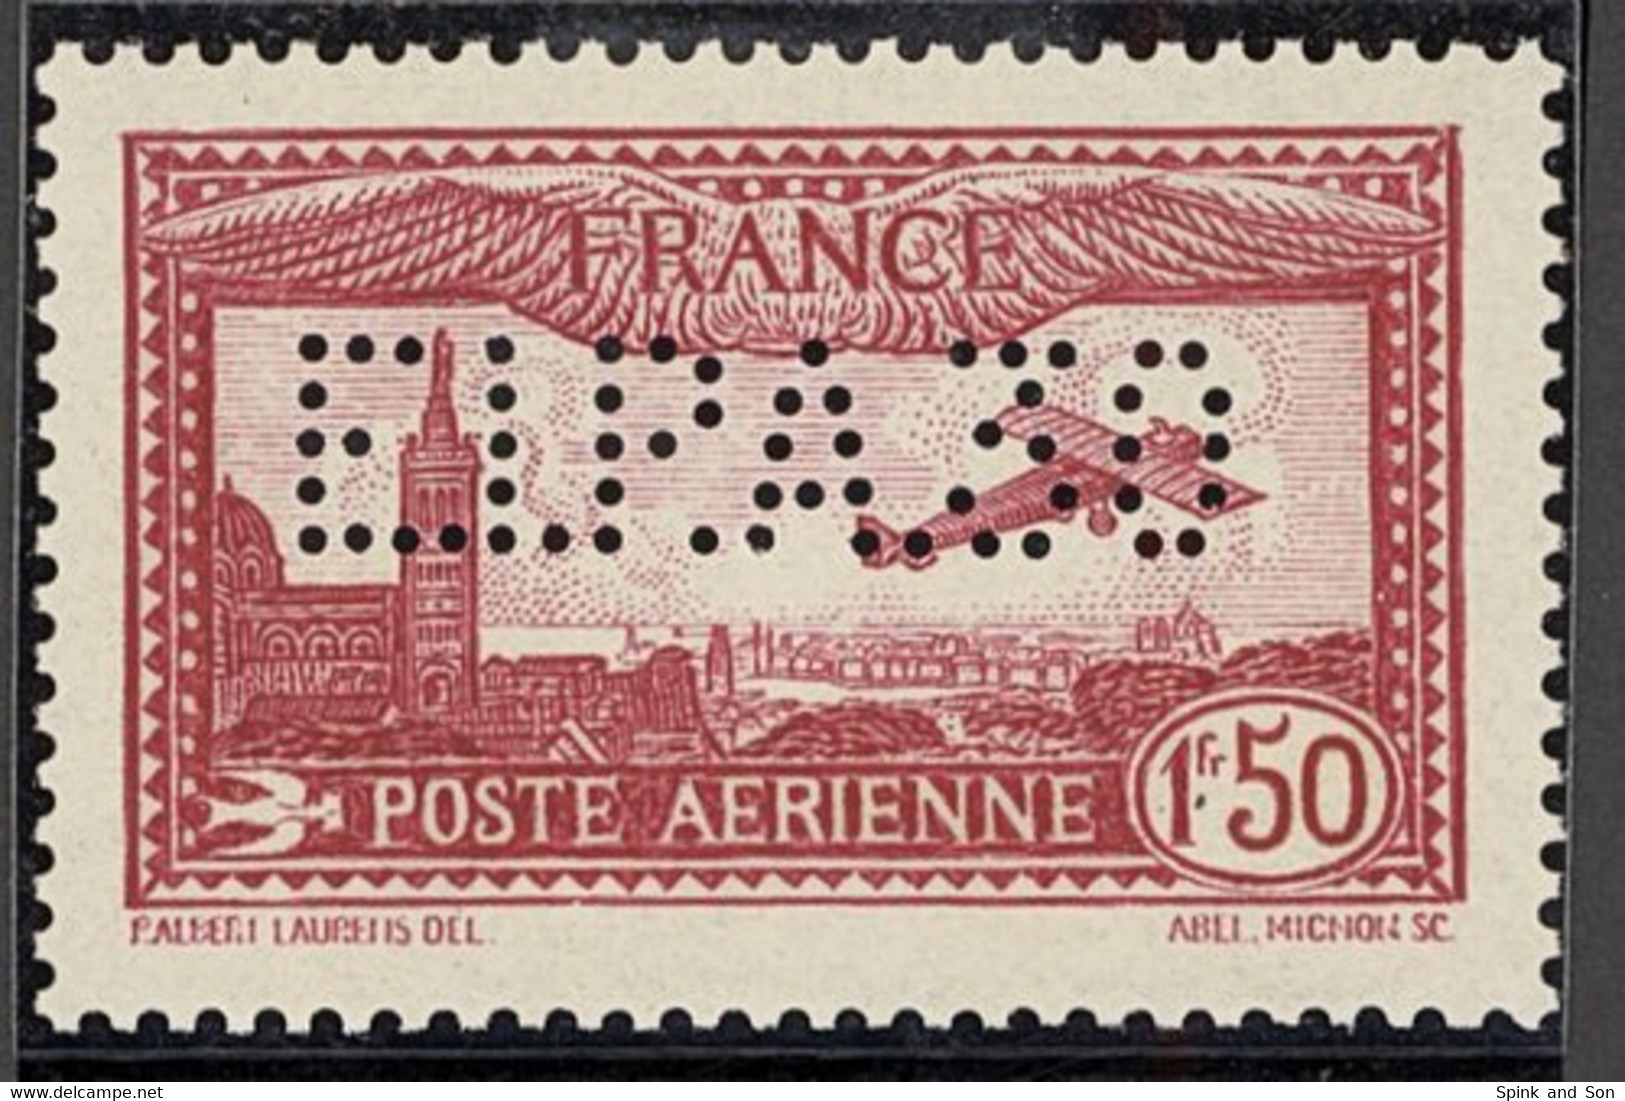 "X France Air Mails 1930 ""EIPA 30"" (Exposition Internationale De Poste Aérienne) 1f. 50 Carmine, Unmounted Mint; Slightly - Sin Clasificación"